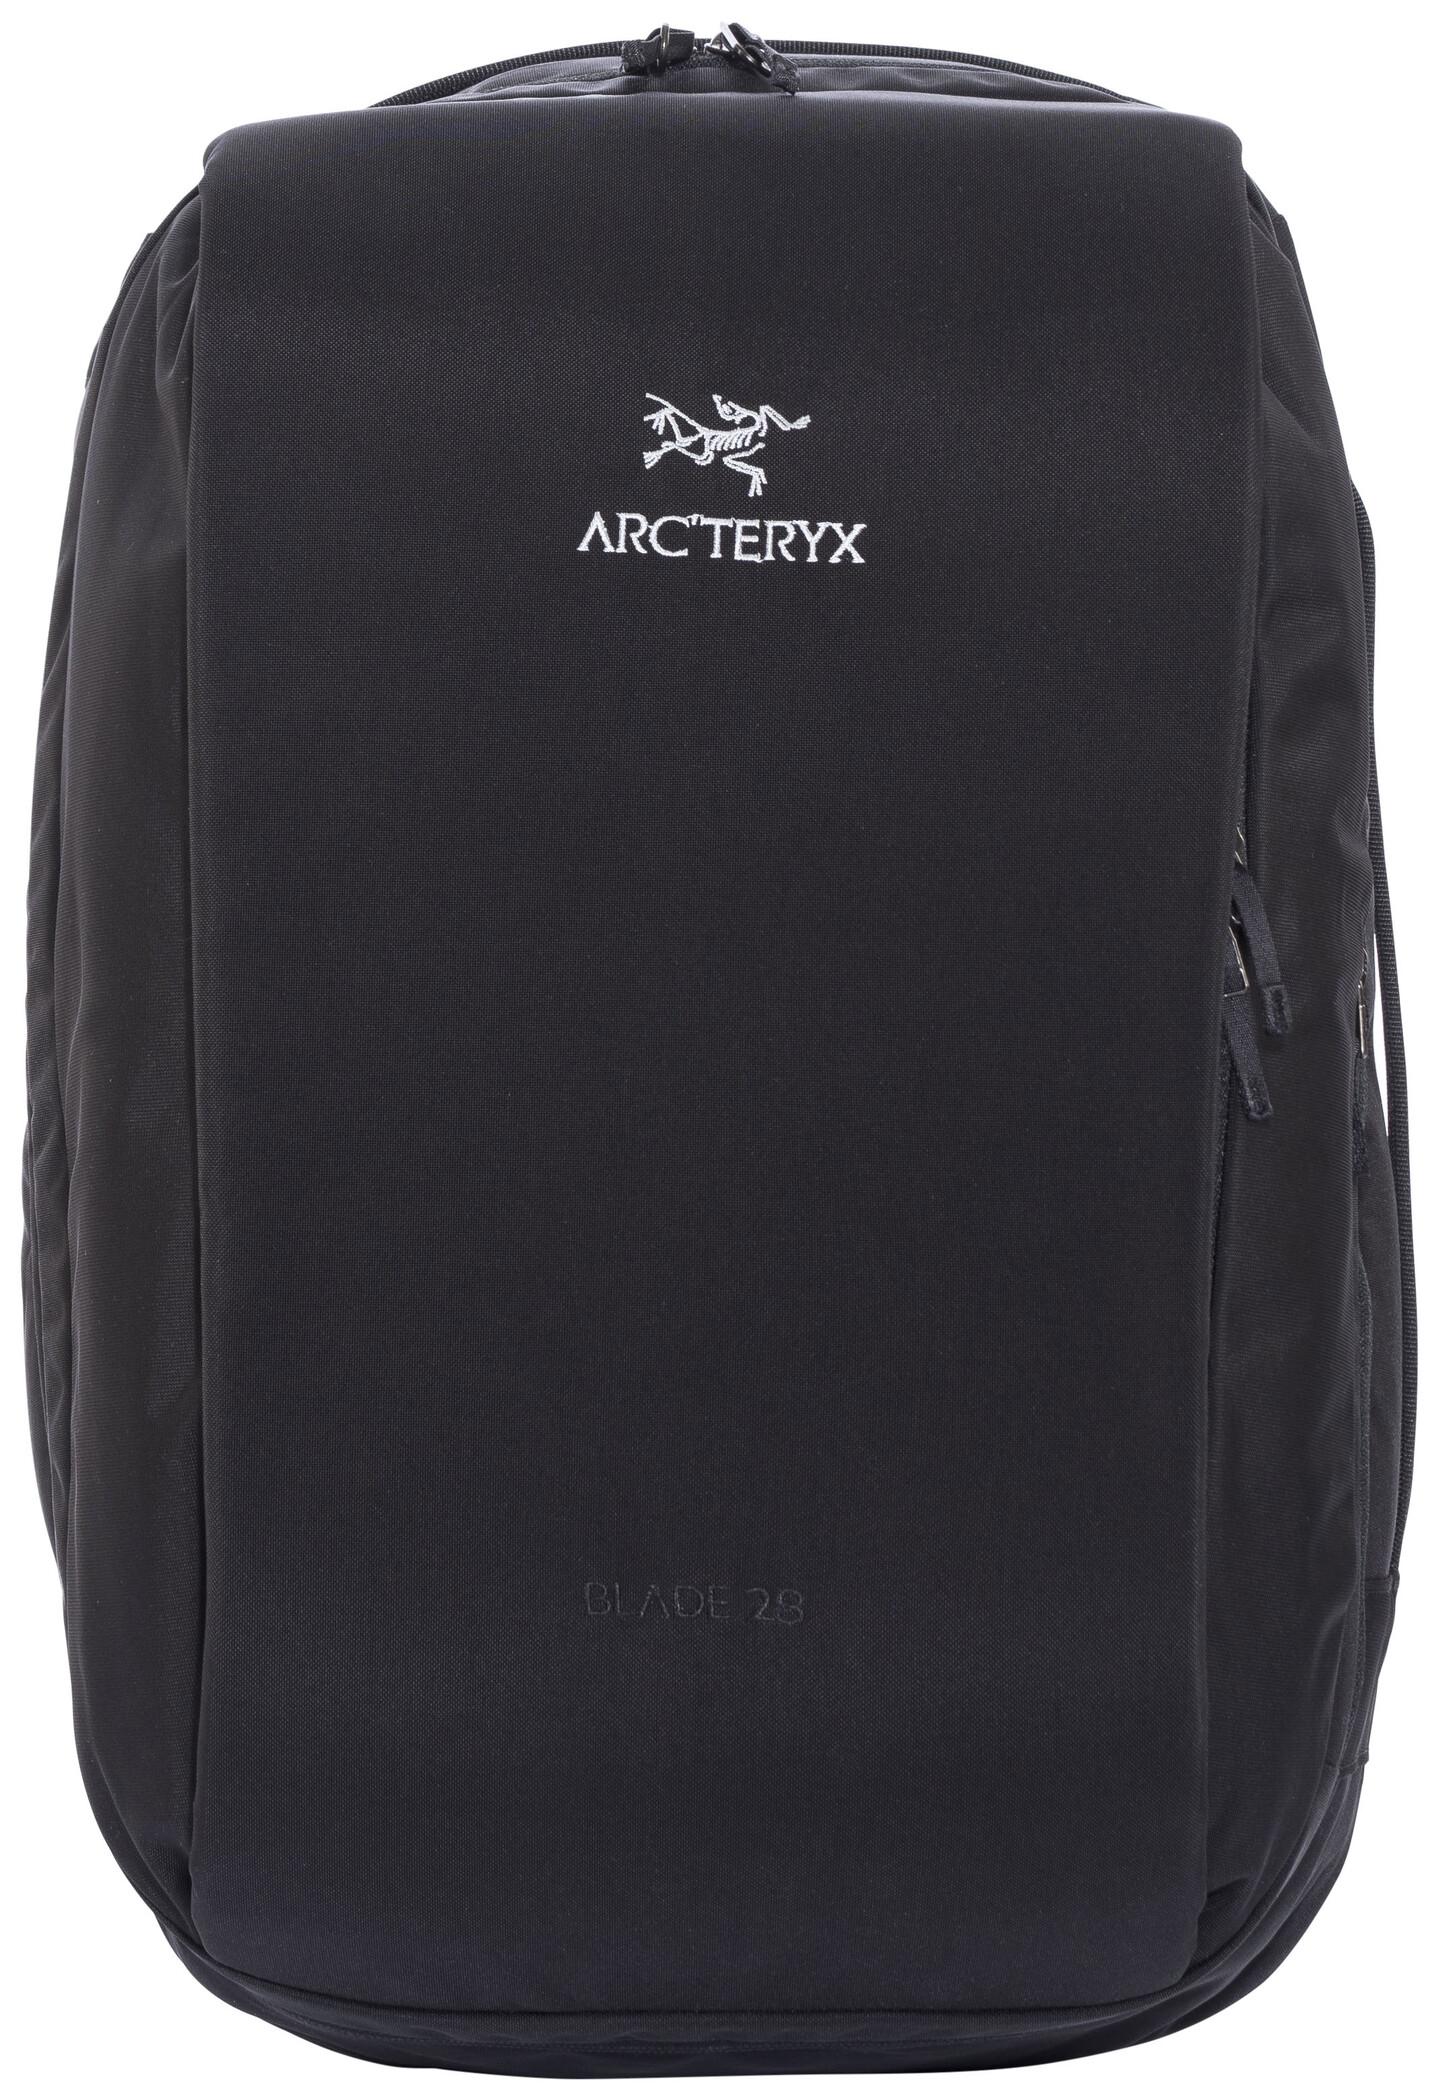 Arc'teryx Blade 28 Rygsæk, black (2019)   Travel bags